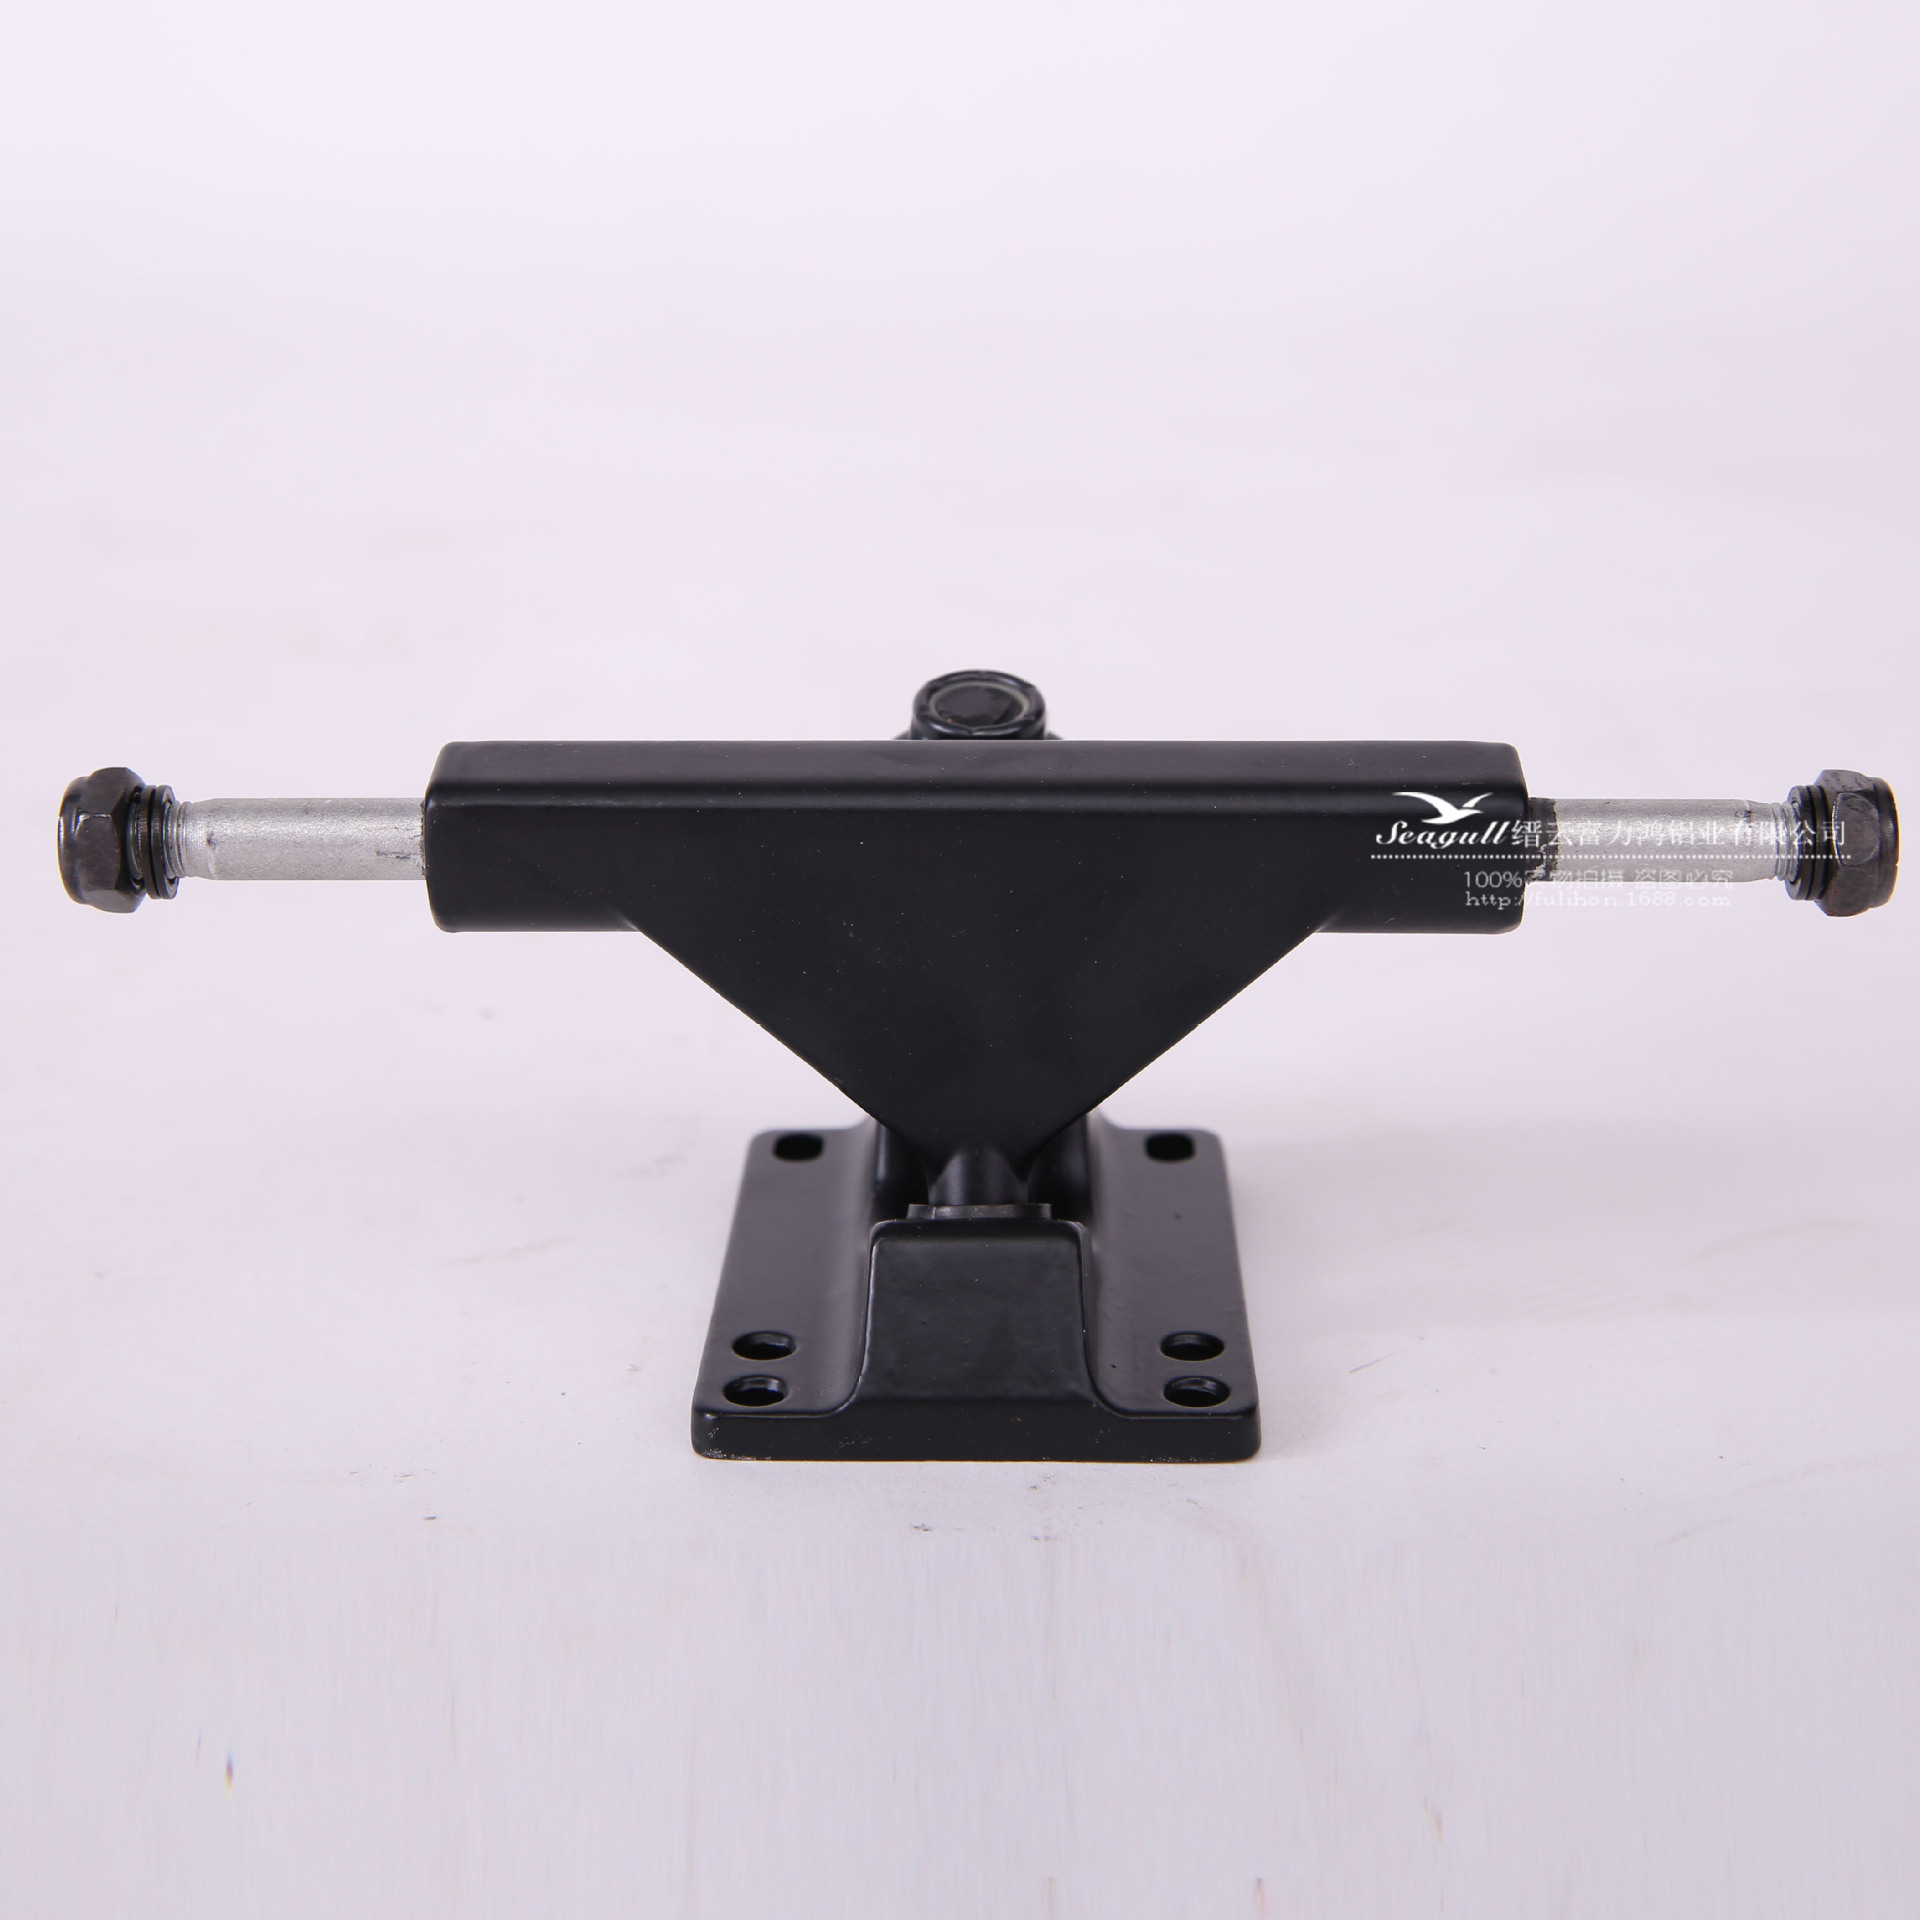 Fish Skateboard/Seagulls Aluminum Bracket/Tray/Skateboard Holder/4.0 Inch 170-1 Holder (-Spray Color)